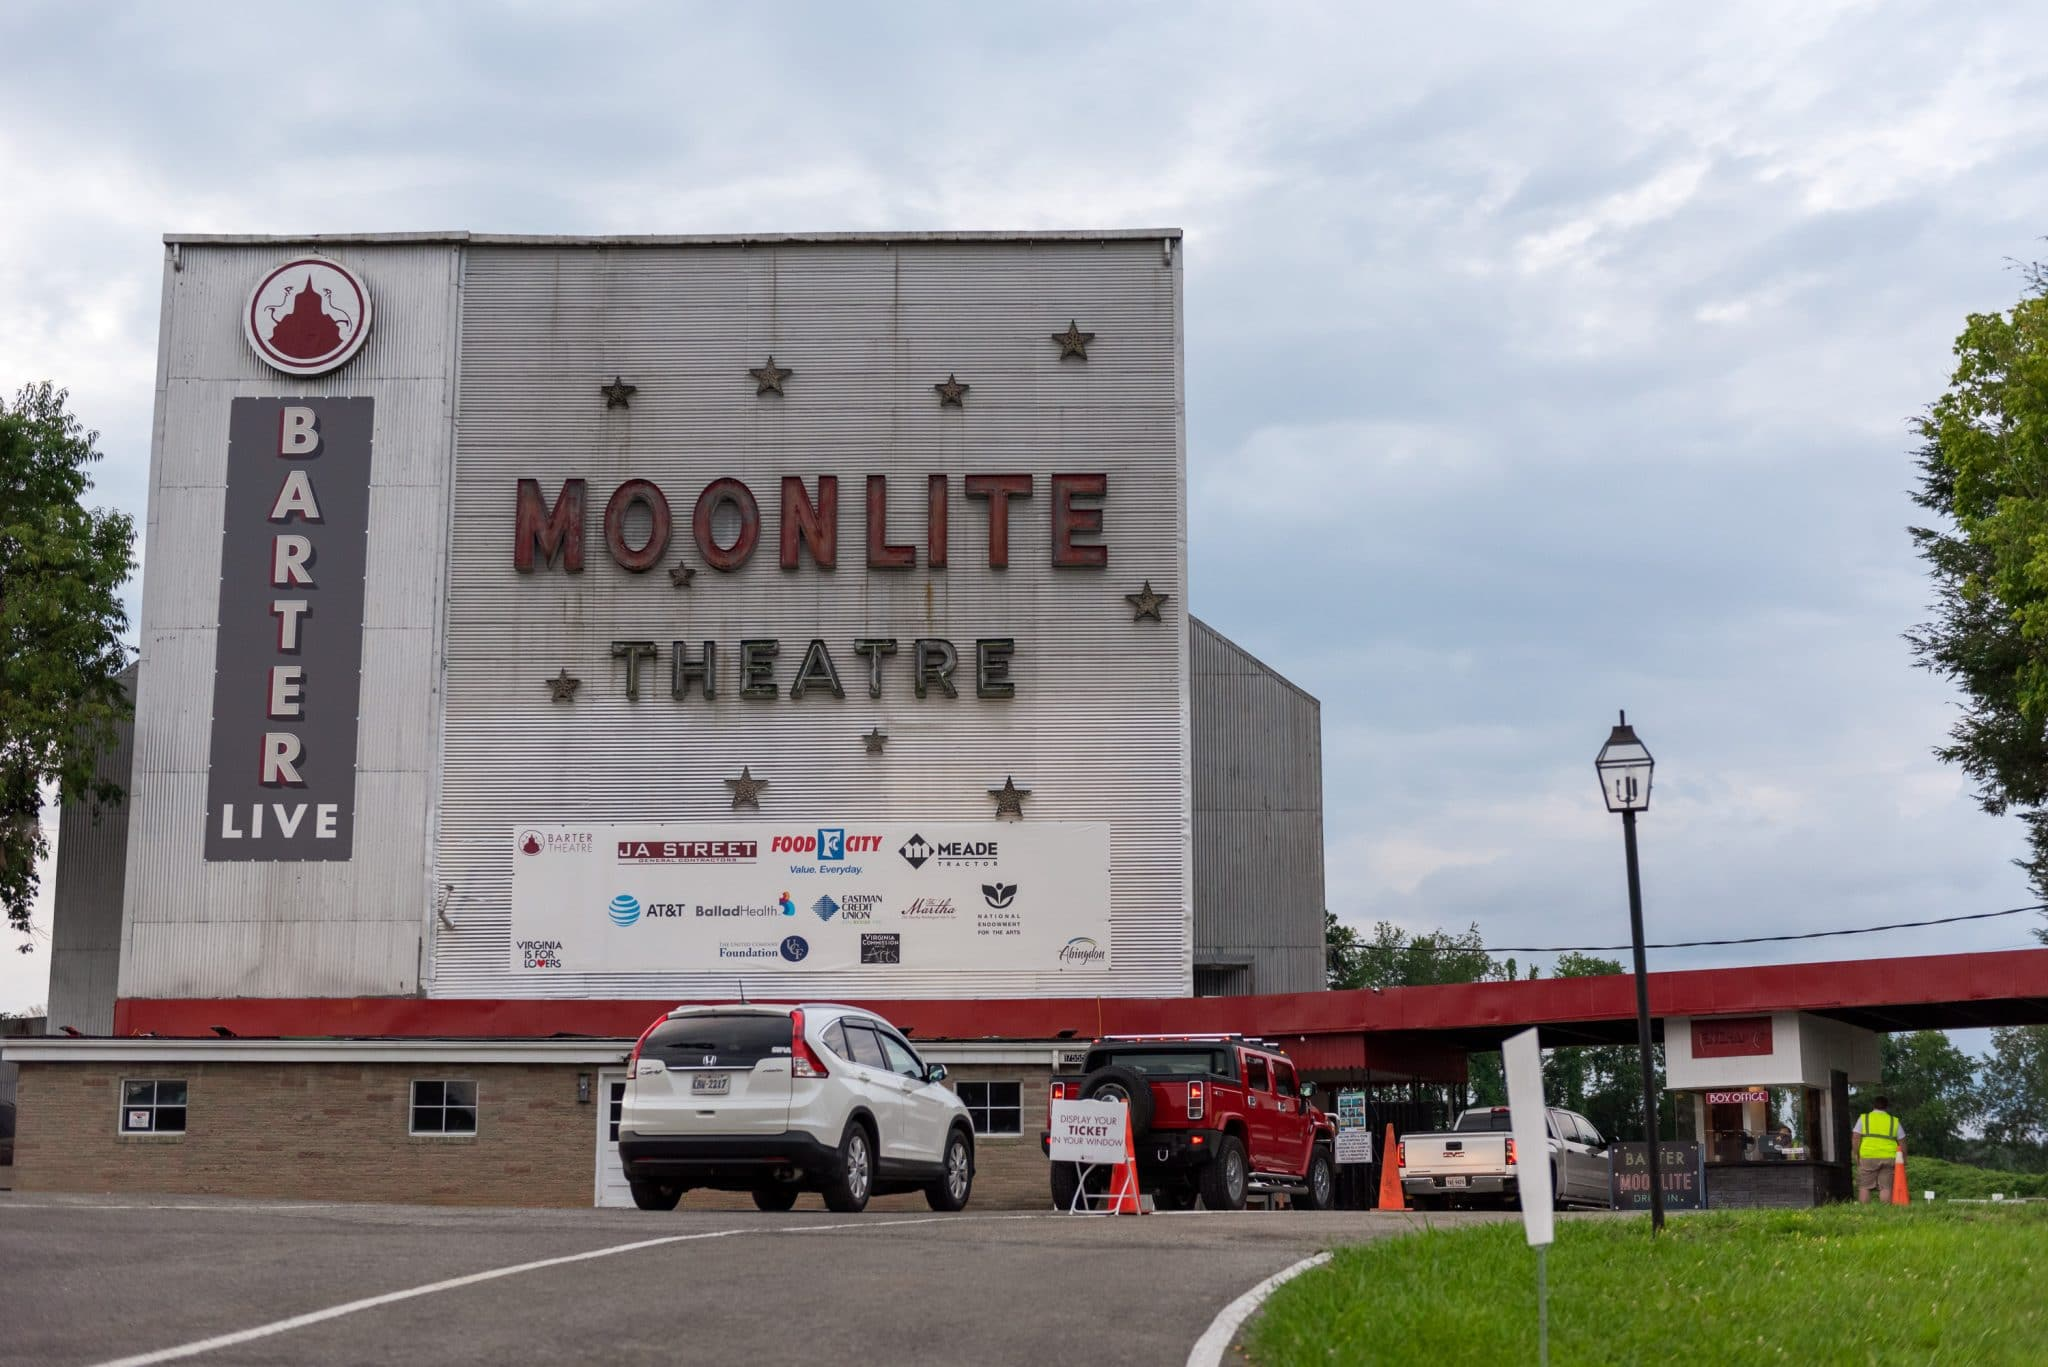 Patrons Entering the Barter Moonlite Theatre